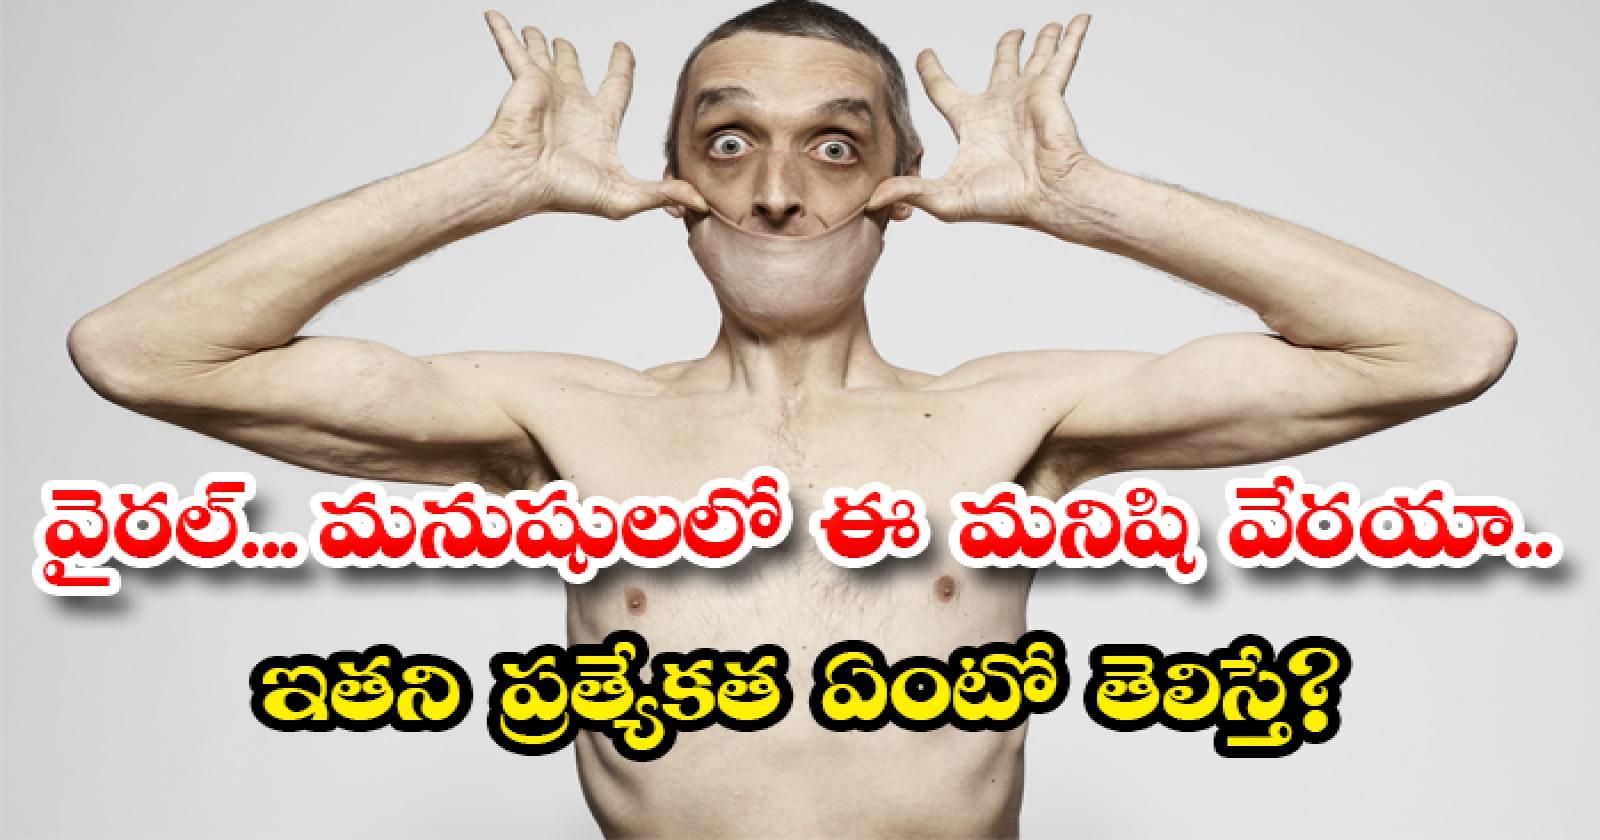 Viral Is This Man Different From Other People If You Know His Uniqueness-వైరల్… మనుషులలో ఈ మనిషి వేరయా.. ఇతని ప్రత్యేకత ఏంటో తెలిస్తే-General-Telugu-Telugu Tollywood Photo Image-TeluguStop.com